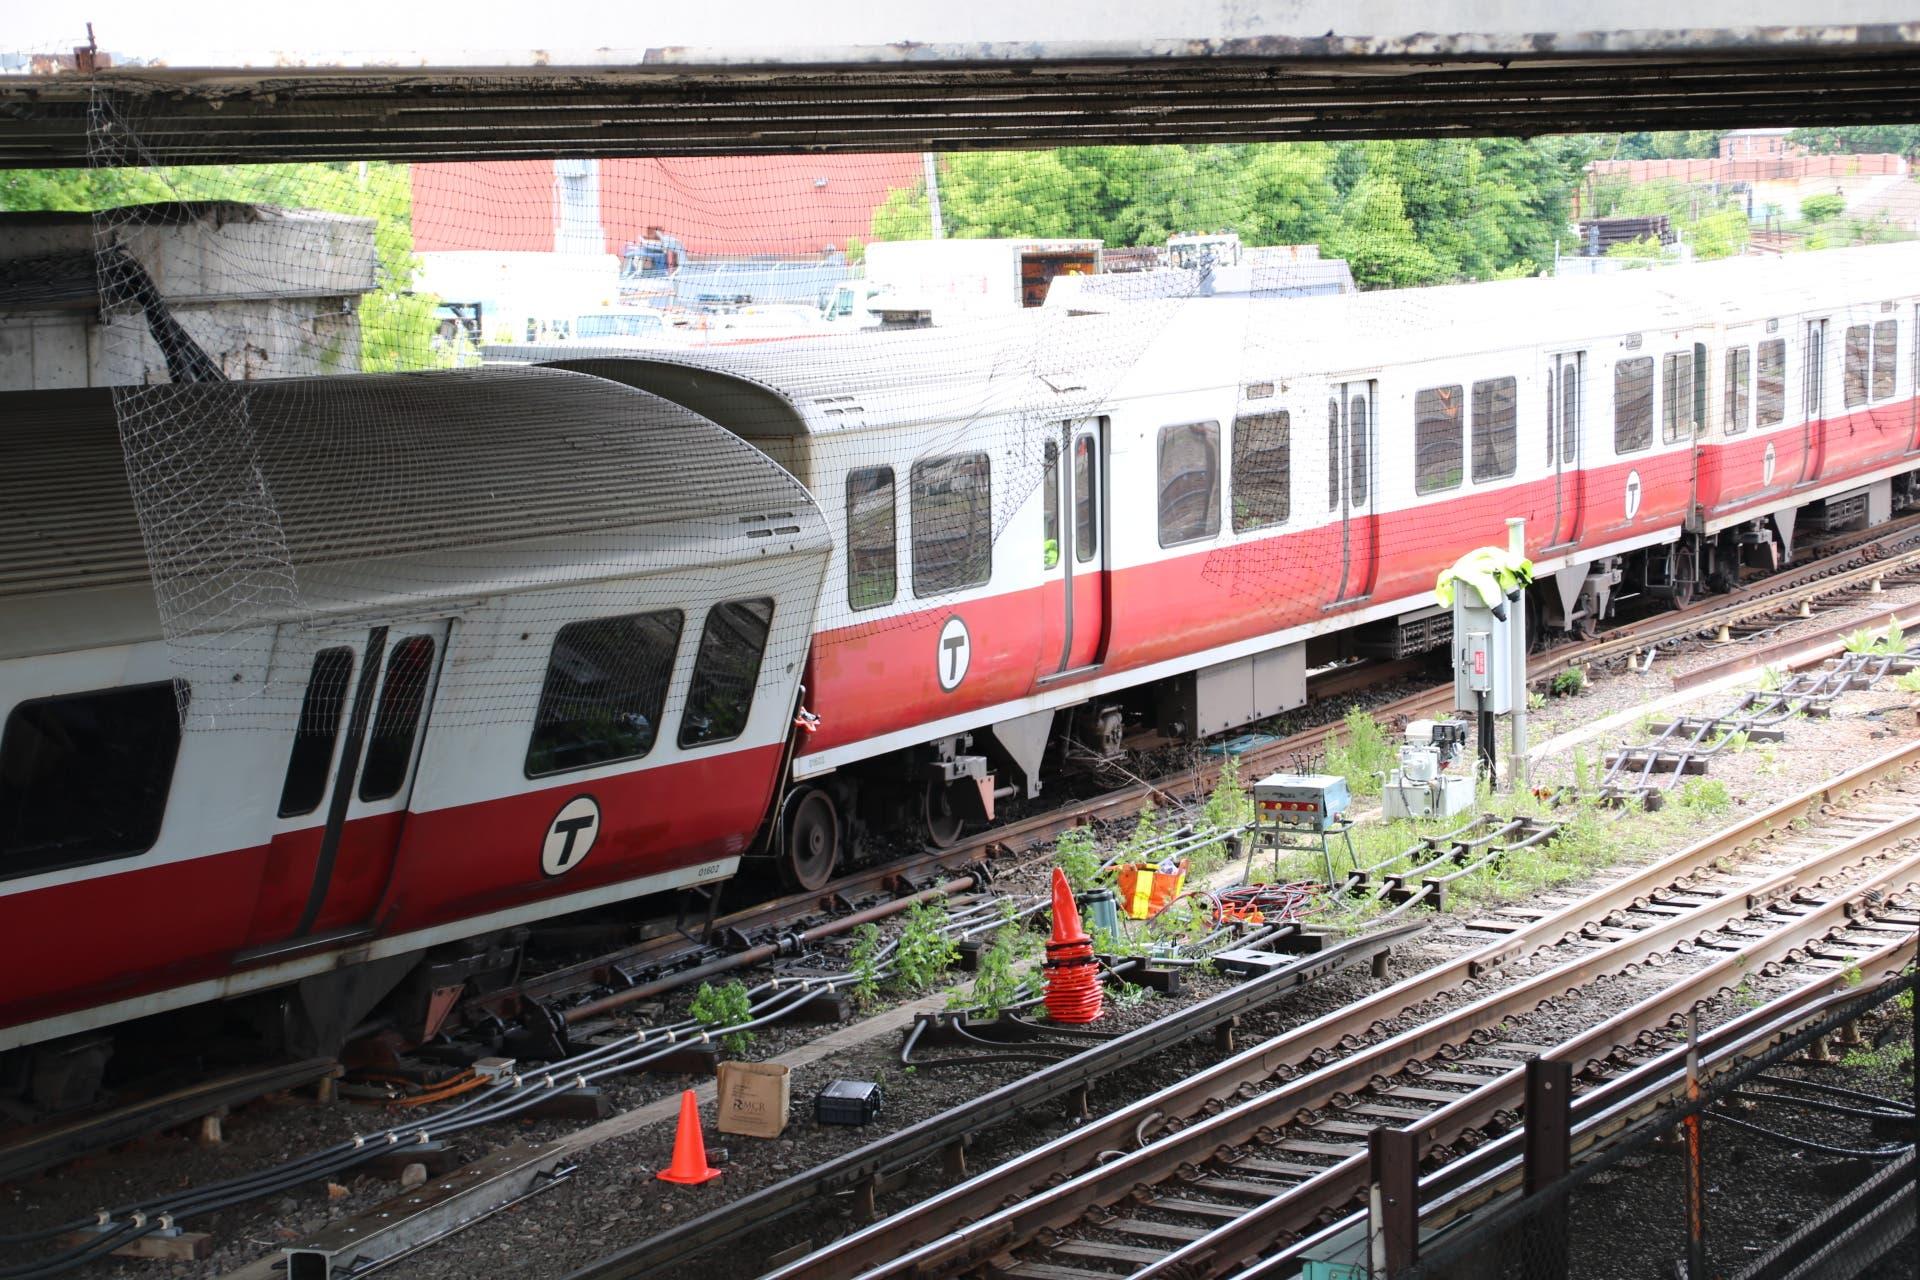 After 4 Train Derailments In 2019, System Still 'Safe:' MBTA